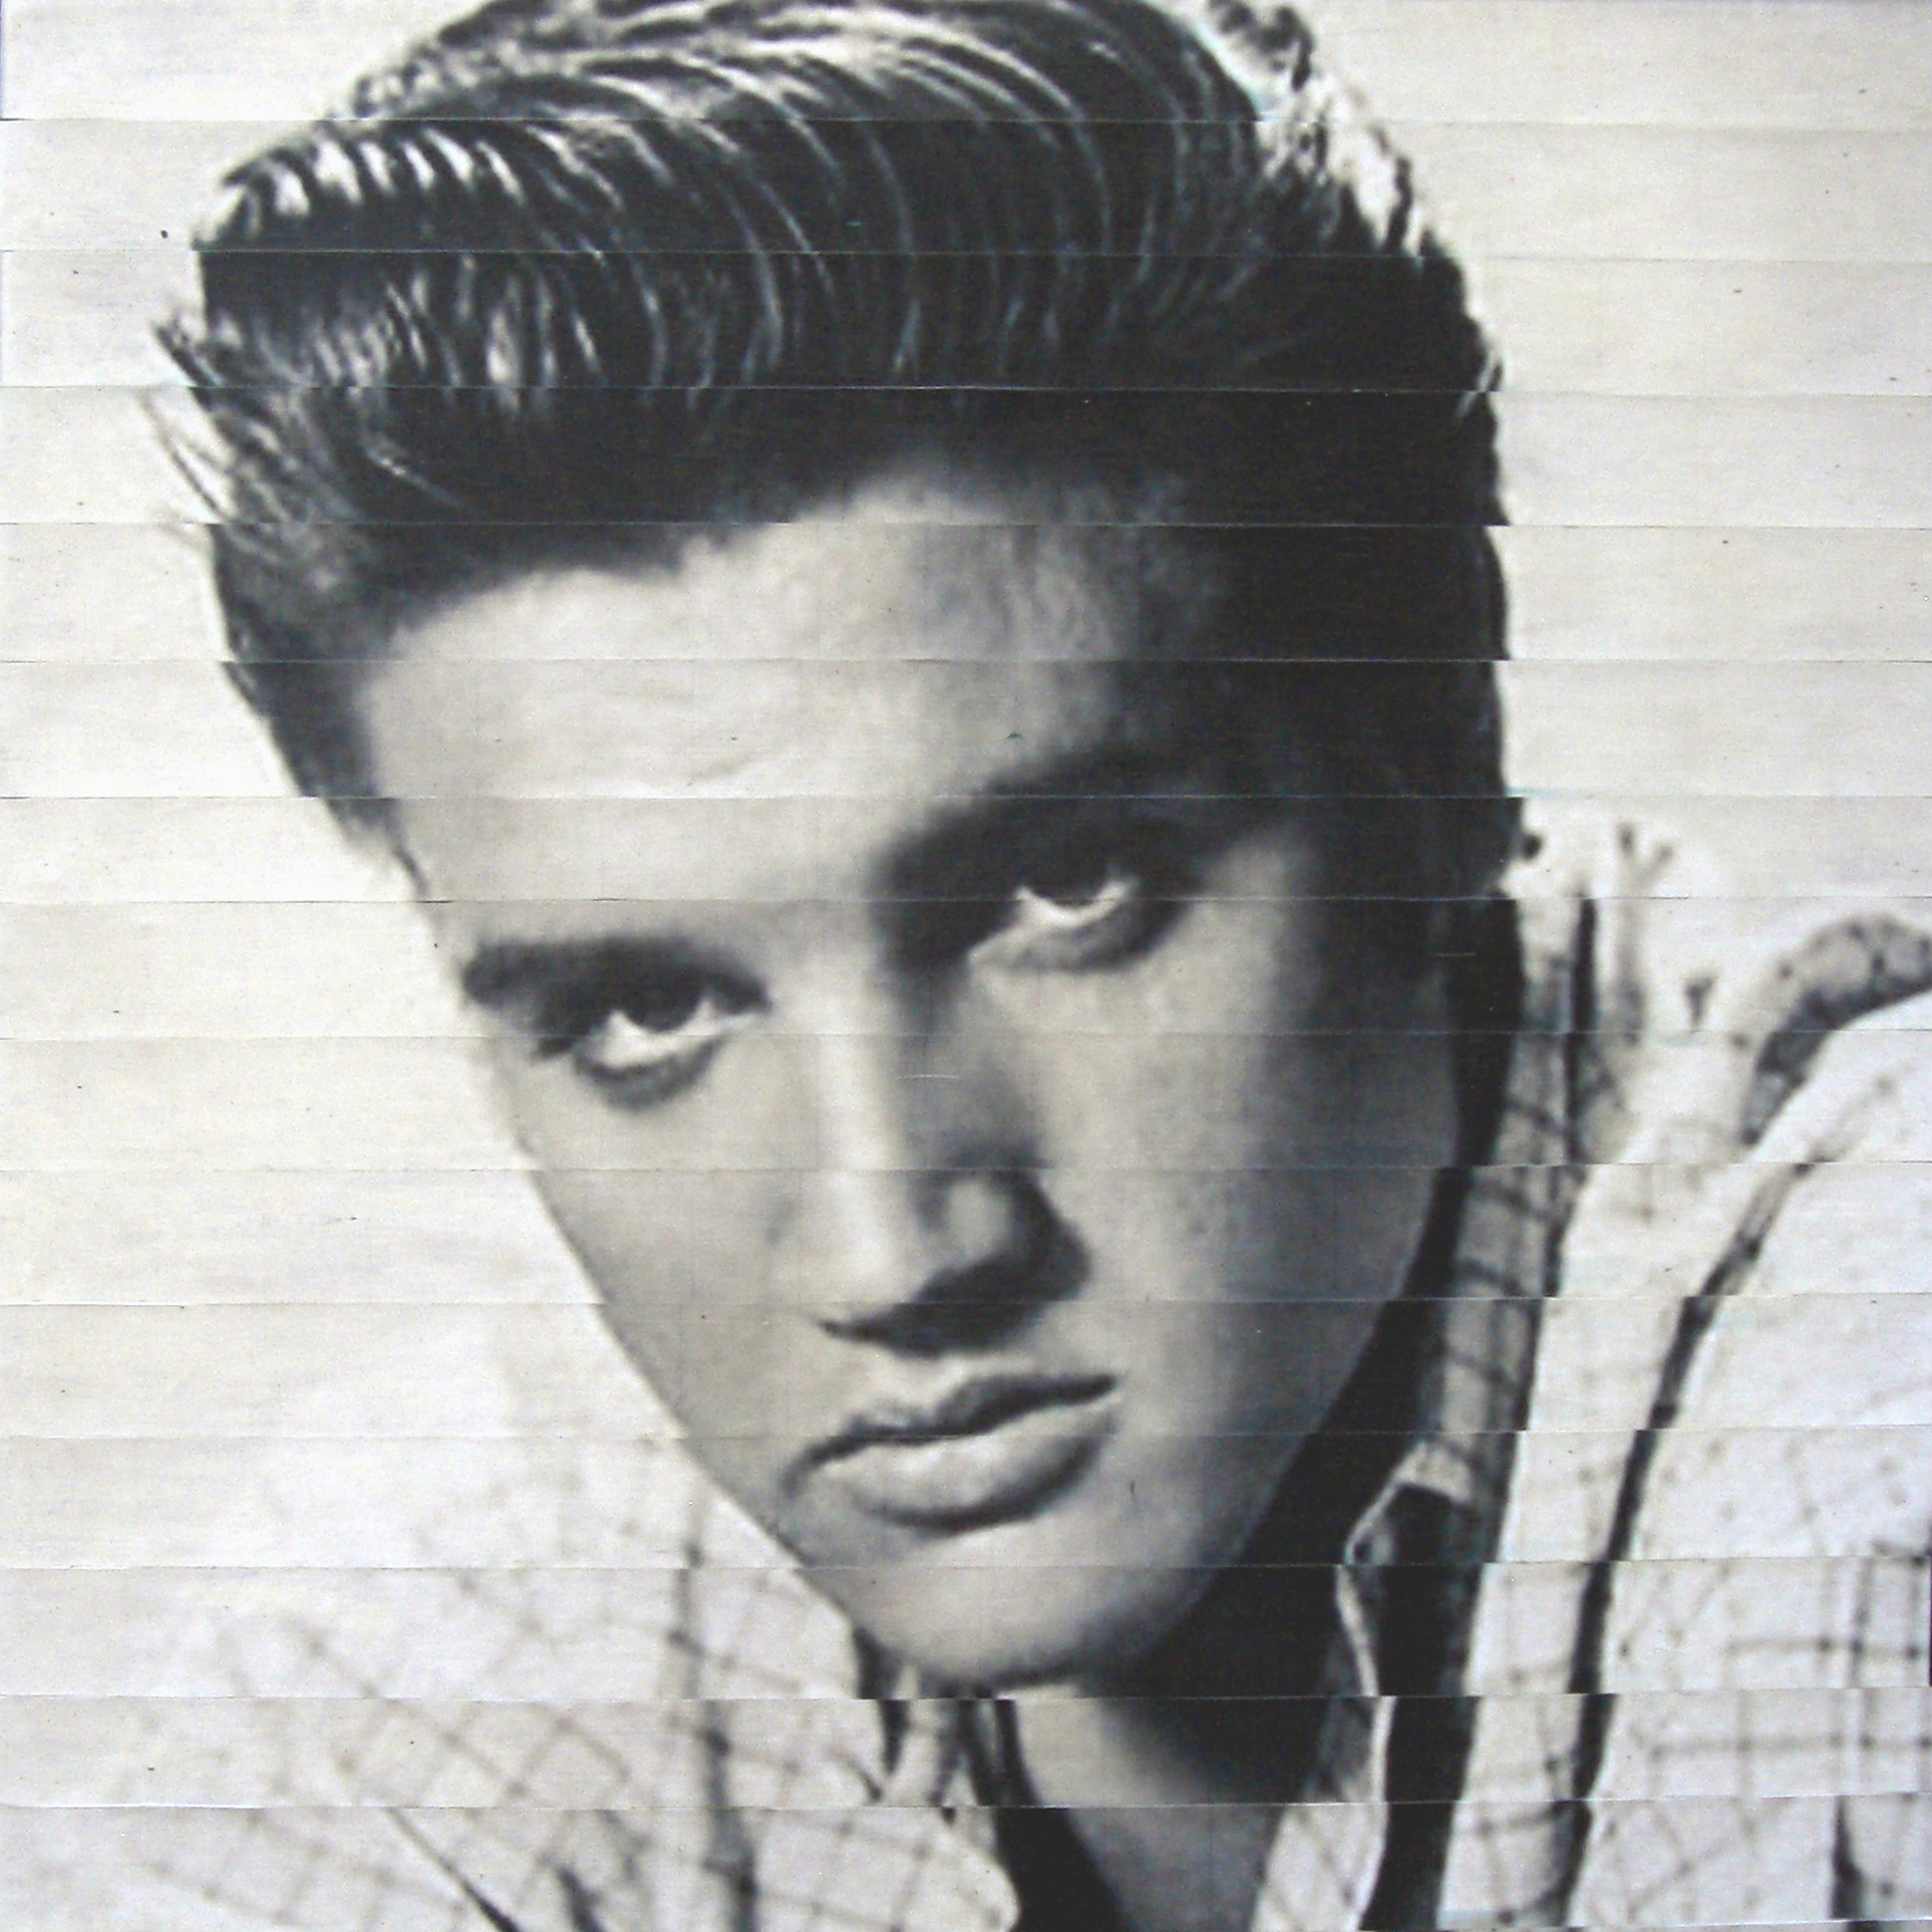 Elvis close-up (2010) Image